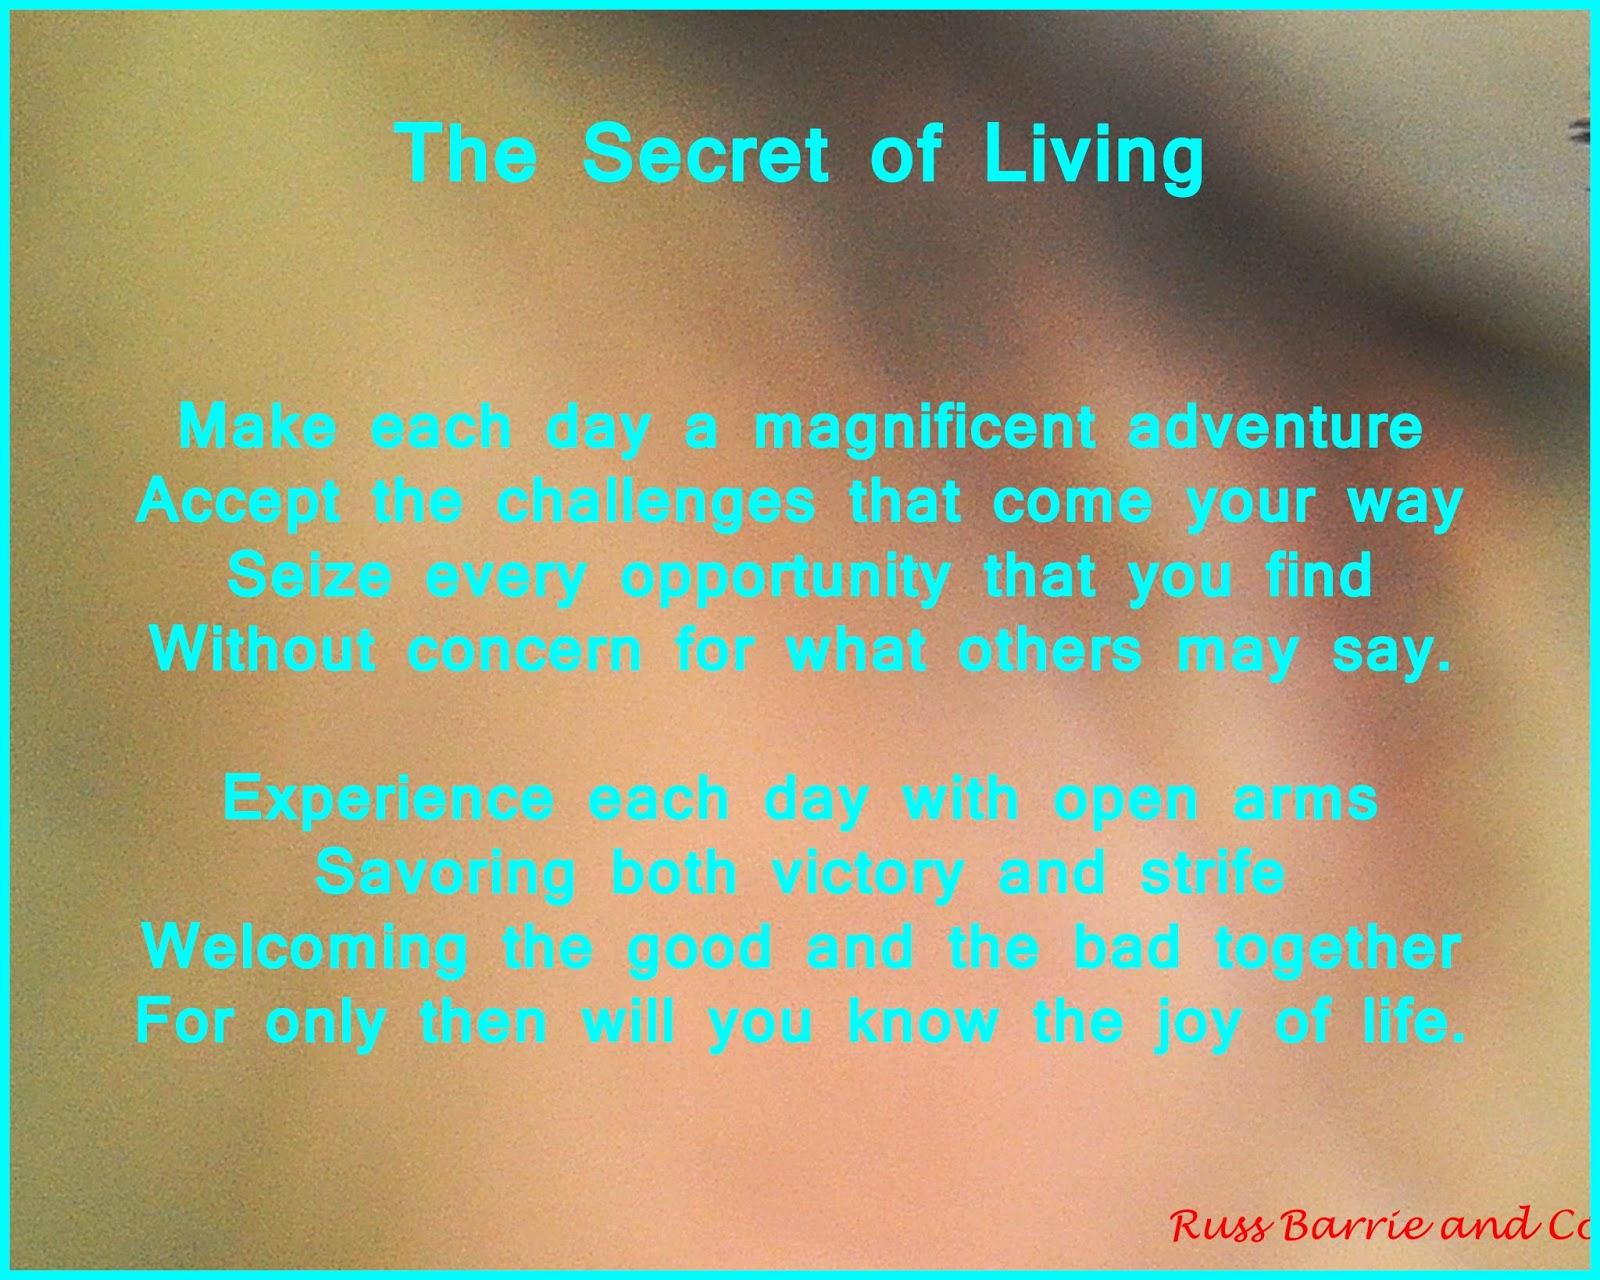 A poem on the secret of life